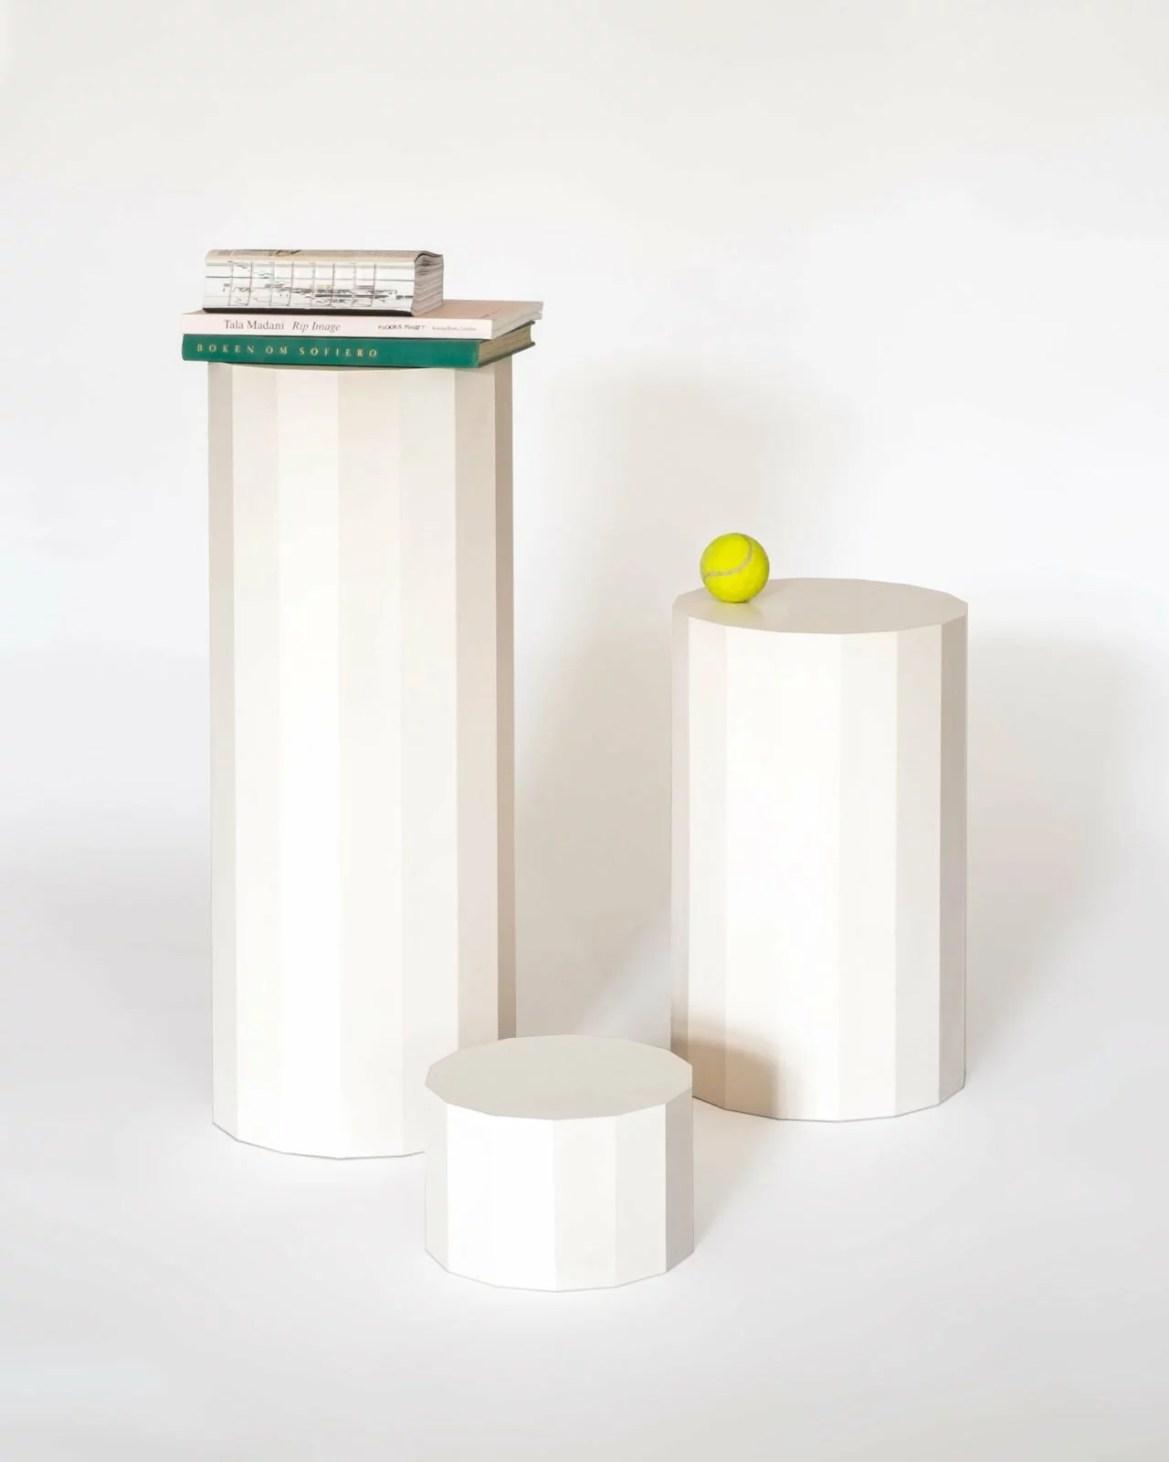 Andréason & Leibel, Column Series